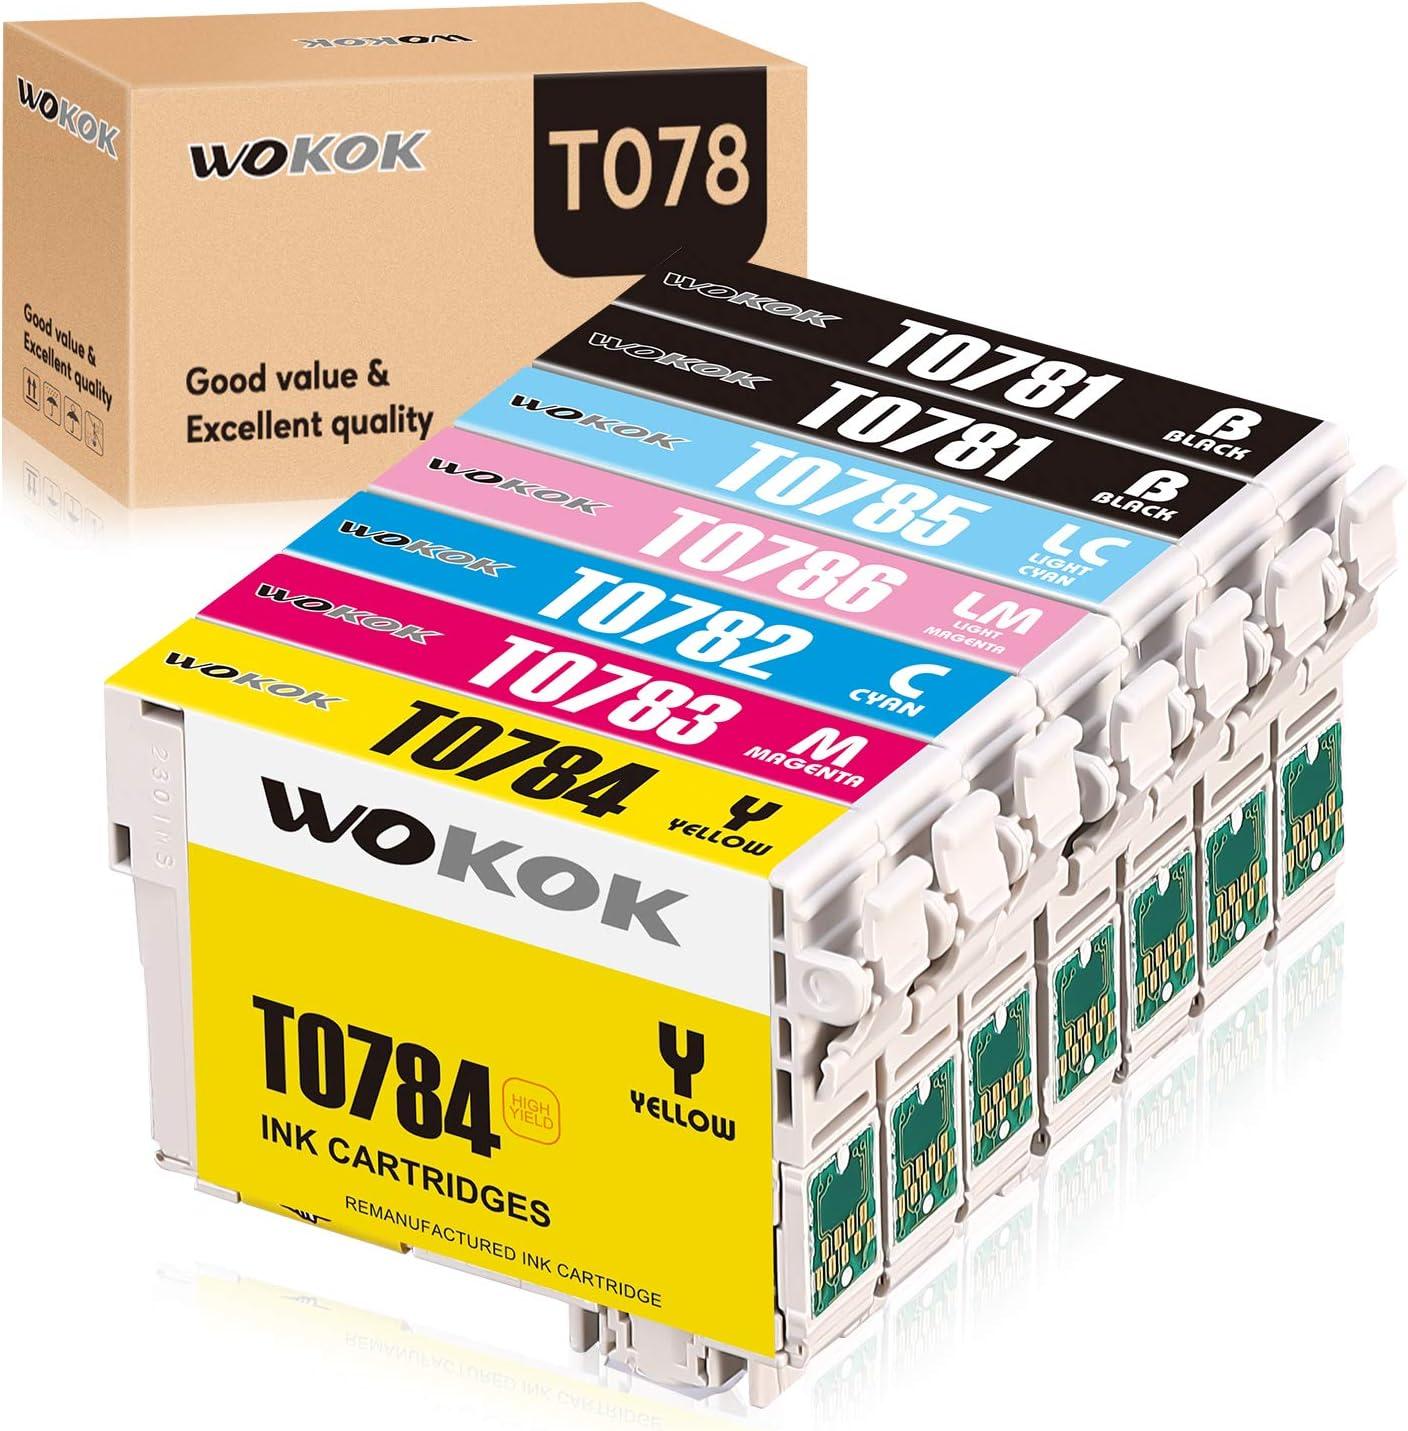 WOKOK Remanufactured Ink Cartridge Replacement for Epson 78 Ink Cartridges, T078 for Epson Artisan 50 Stylus Photo R260 R280 R380 RX580 RX595 RX680 (2BK, 1C, 1M, 1Y, 1LC, 1LM): Office Products